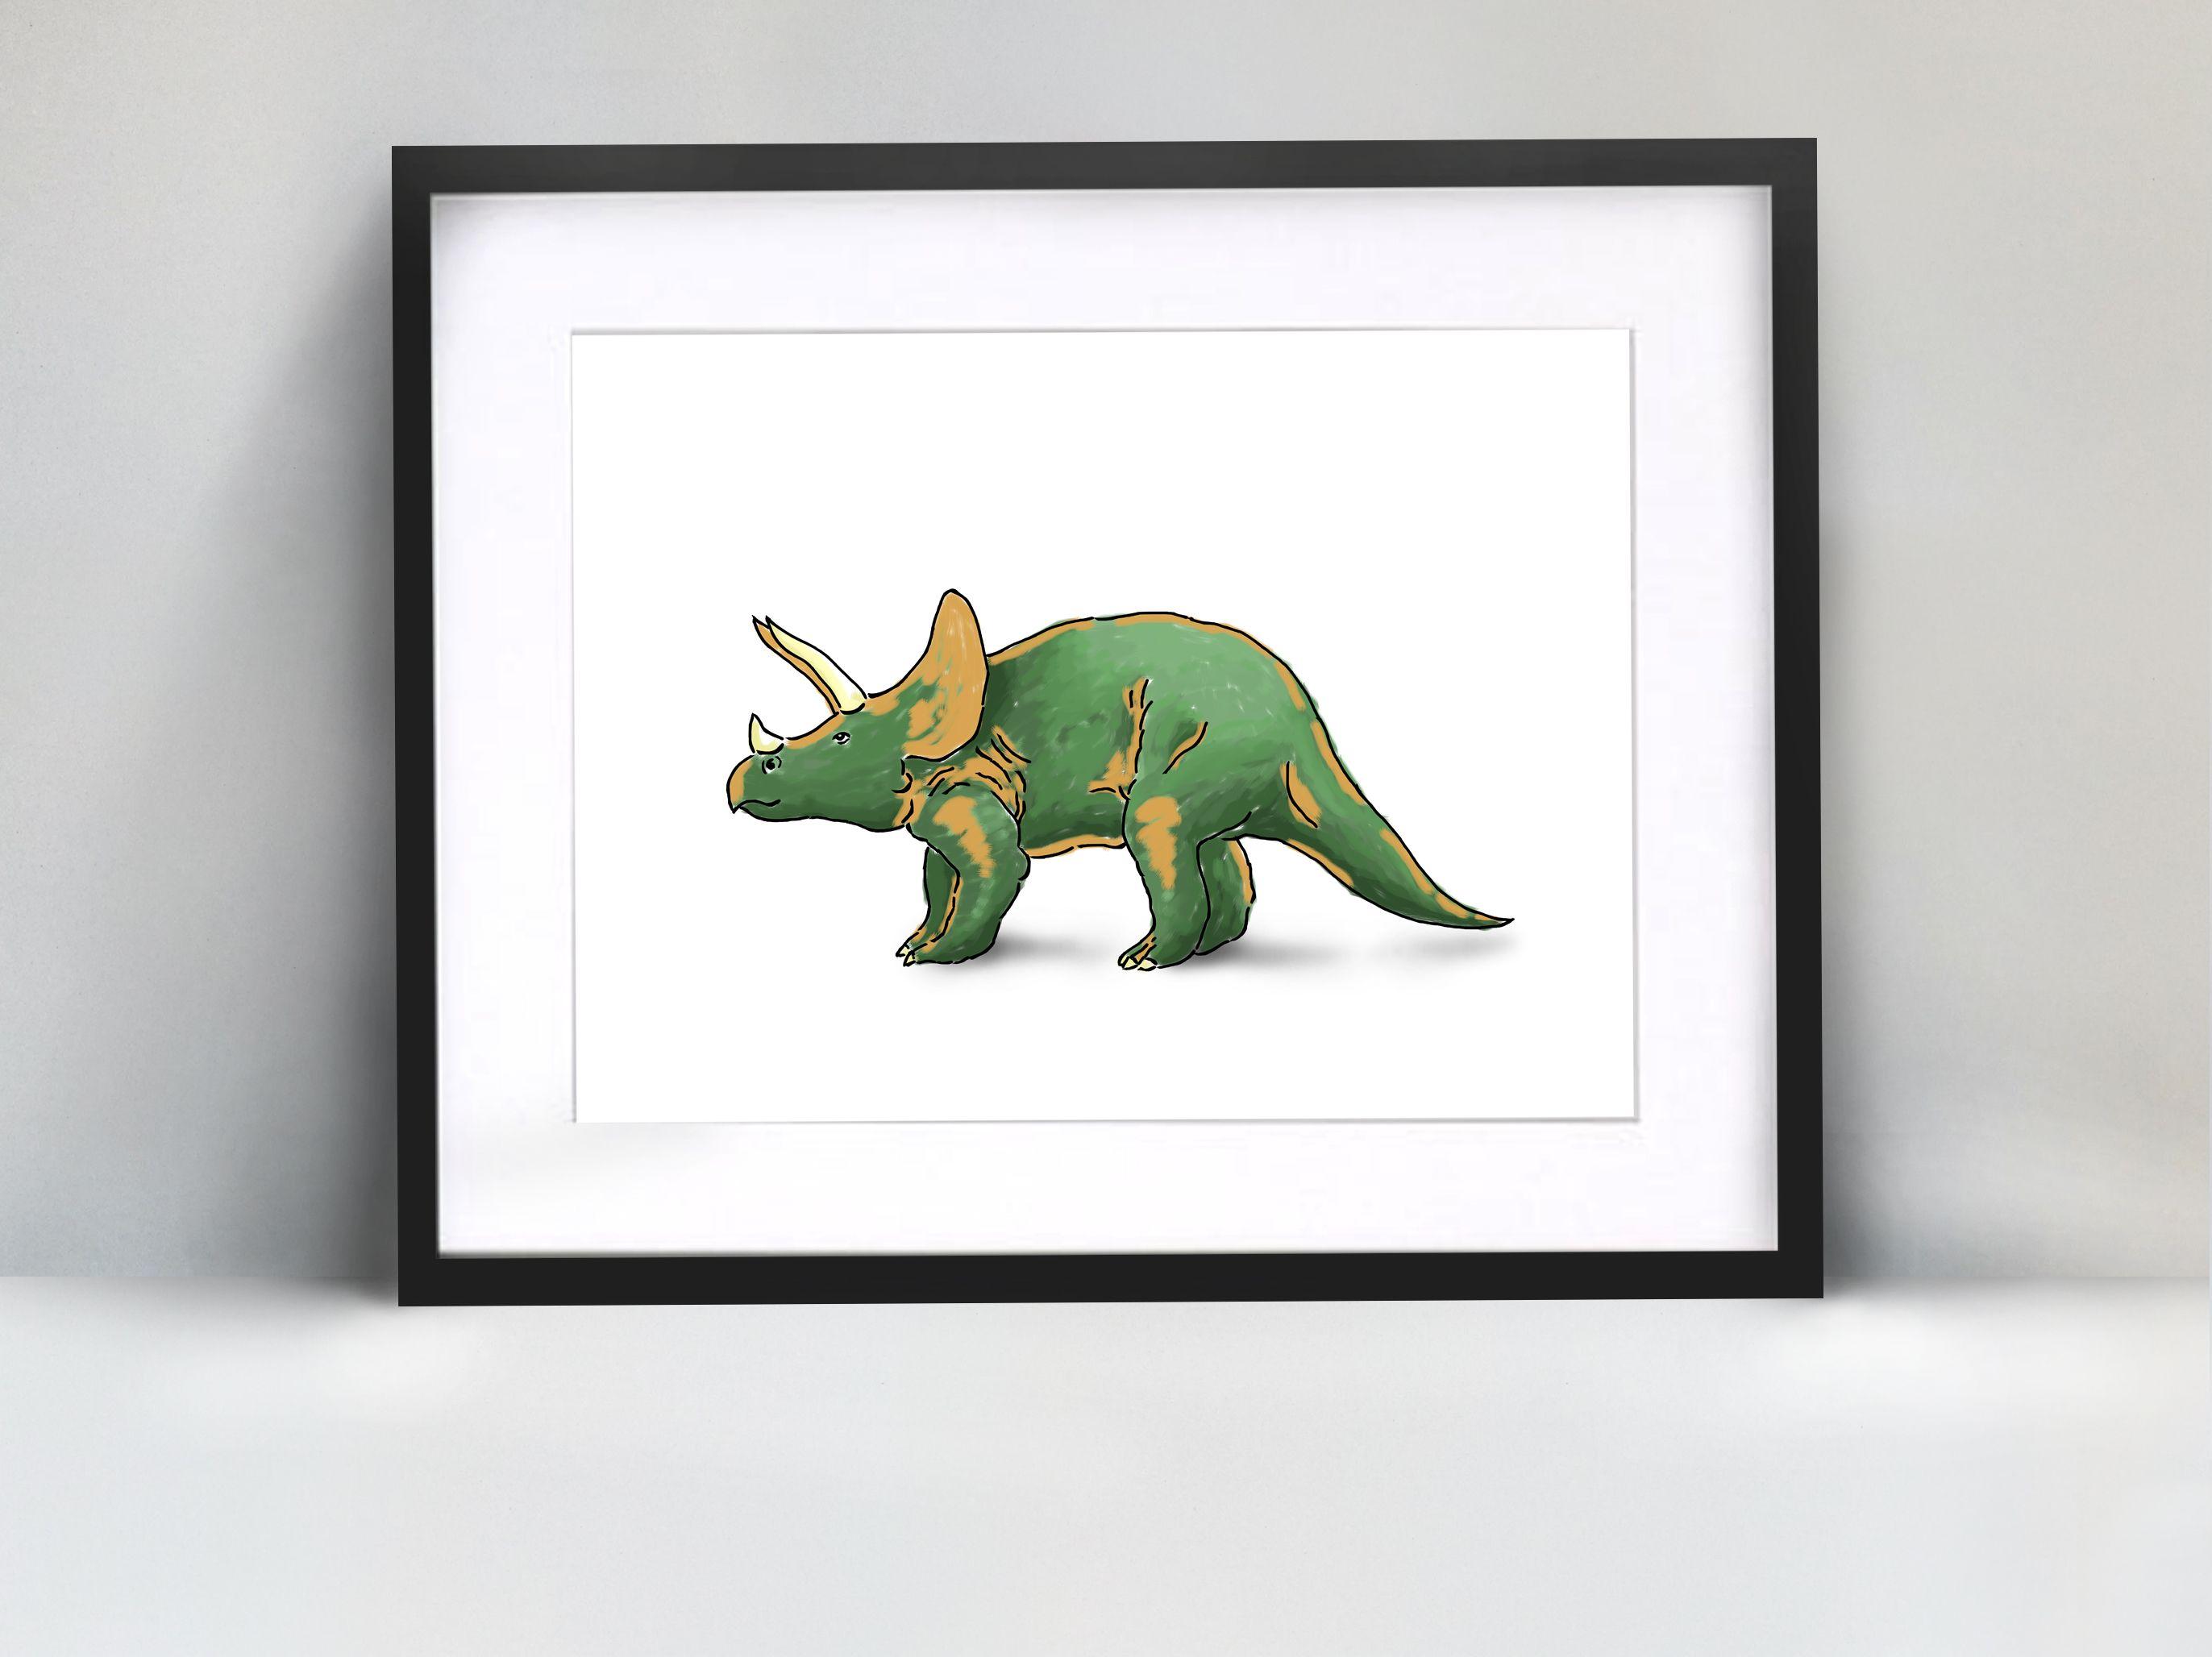 Green And Orange Dinosaur Print Dinosaur Home Decor Digital Art Child Bedroom Kid Play Room Home Decor Wall Art Digital Download Dinosaur Print Dinosaur Home Decor Wall Art